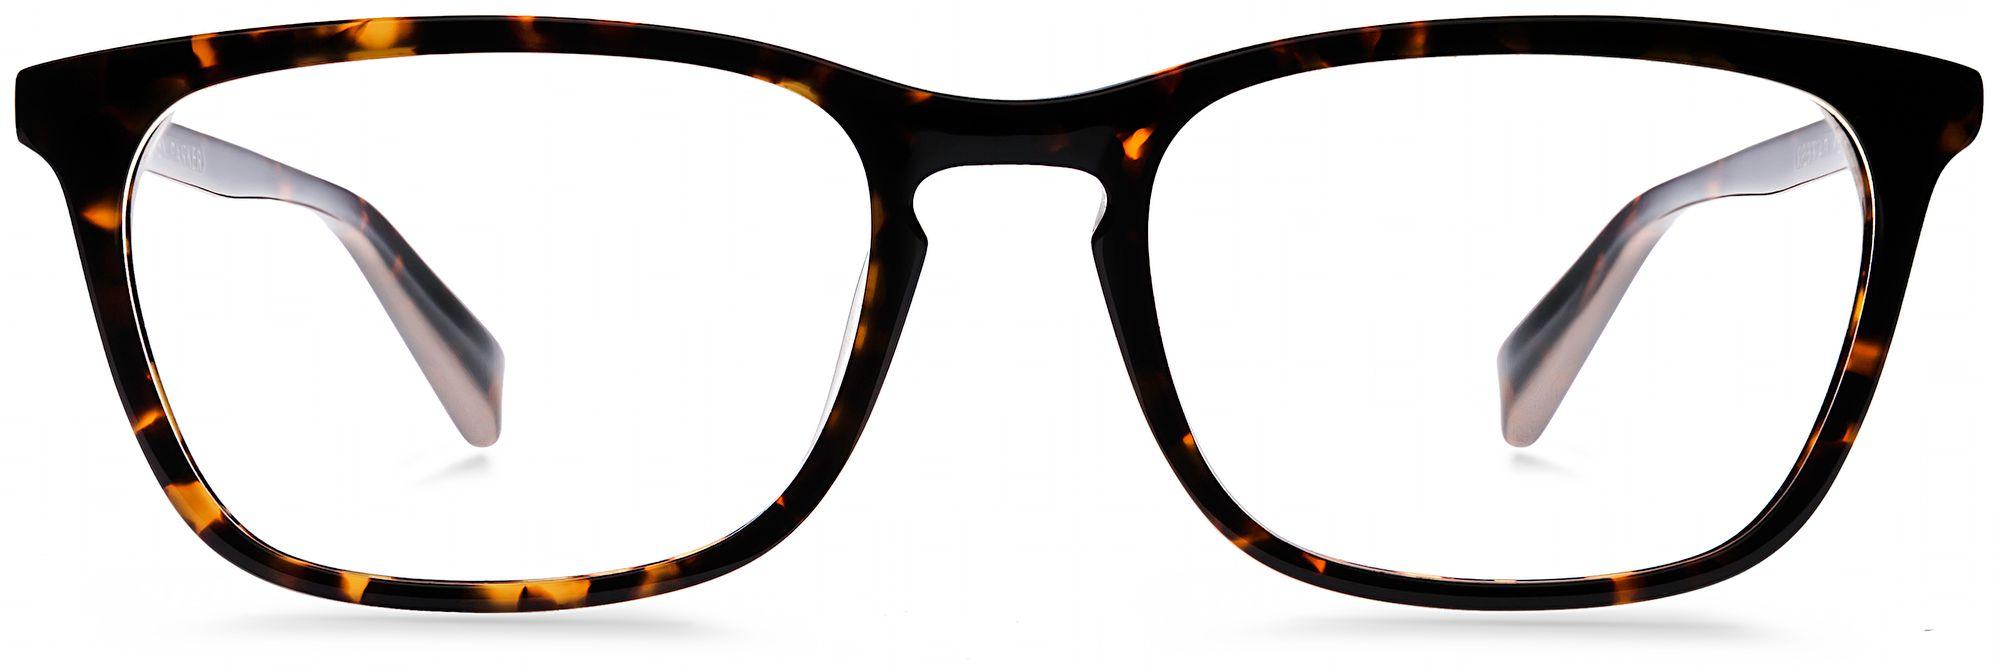 bbd5ebd4d9186 Categories. Hillary Duff wearing sunglasses